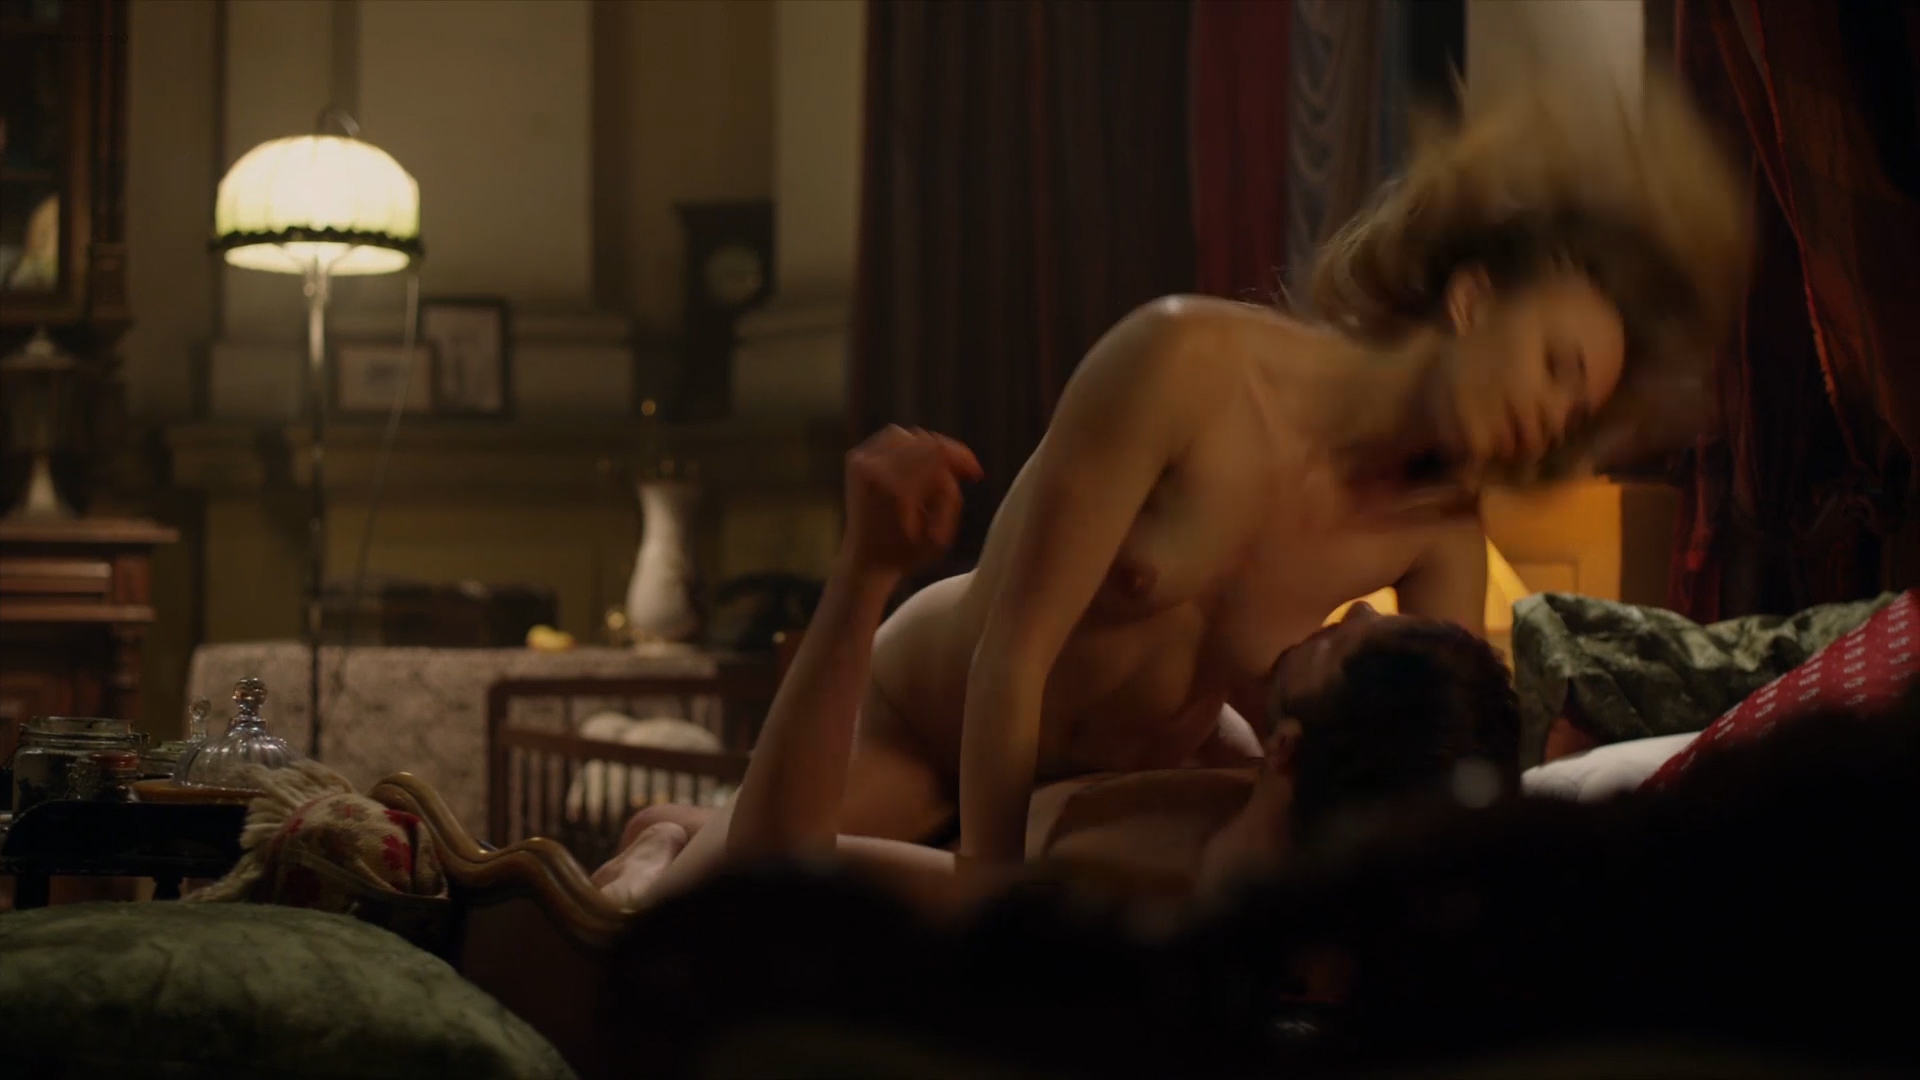 Sadie Katz nude Roxanne Pallett nude sex and others nude - Wrong Turn 6 Last_Resort (2014) hd1080p (5)